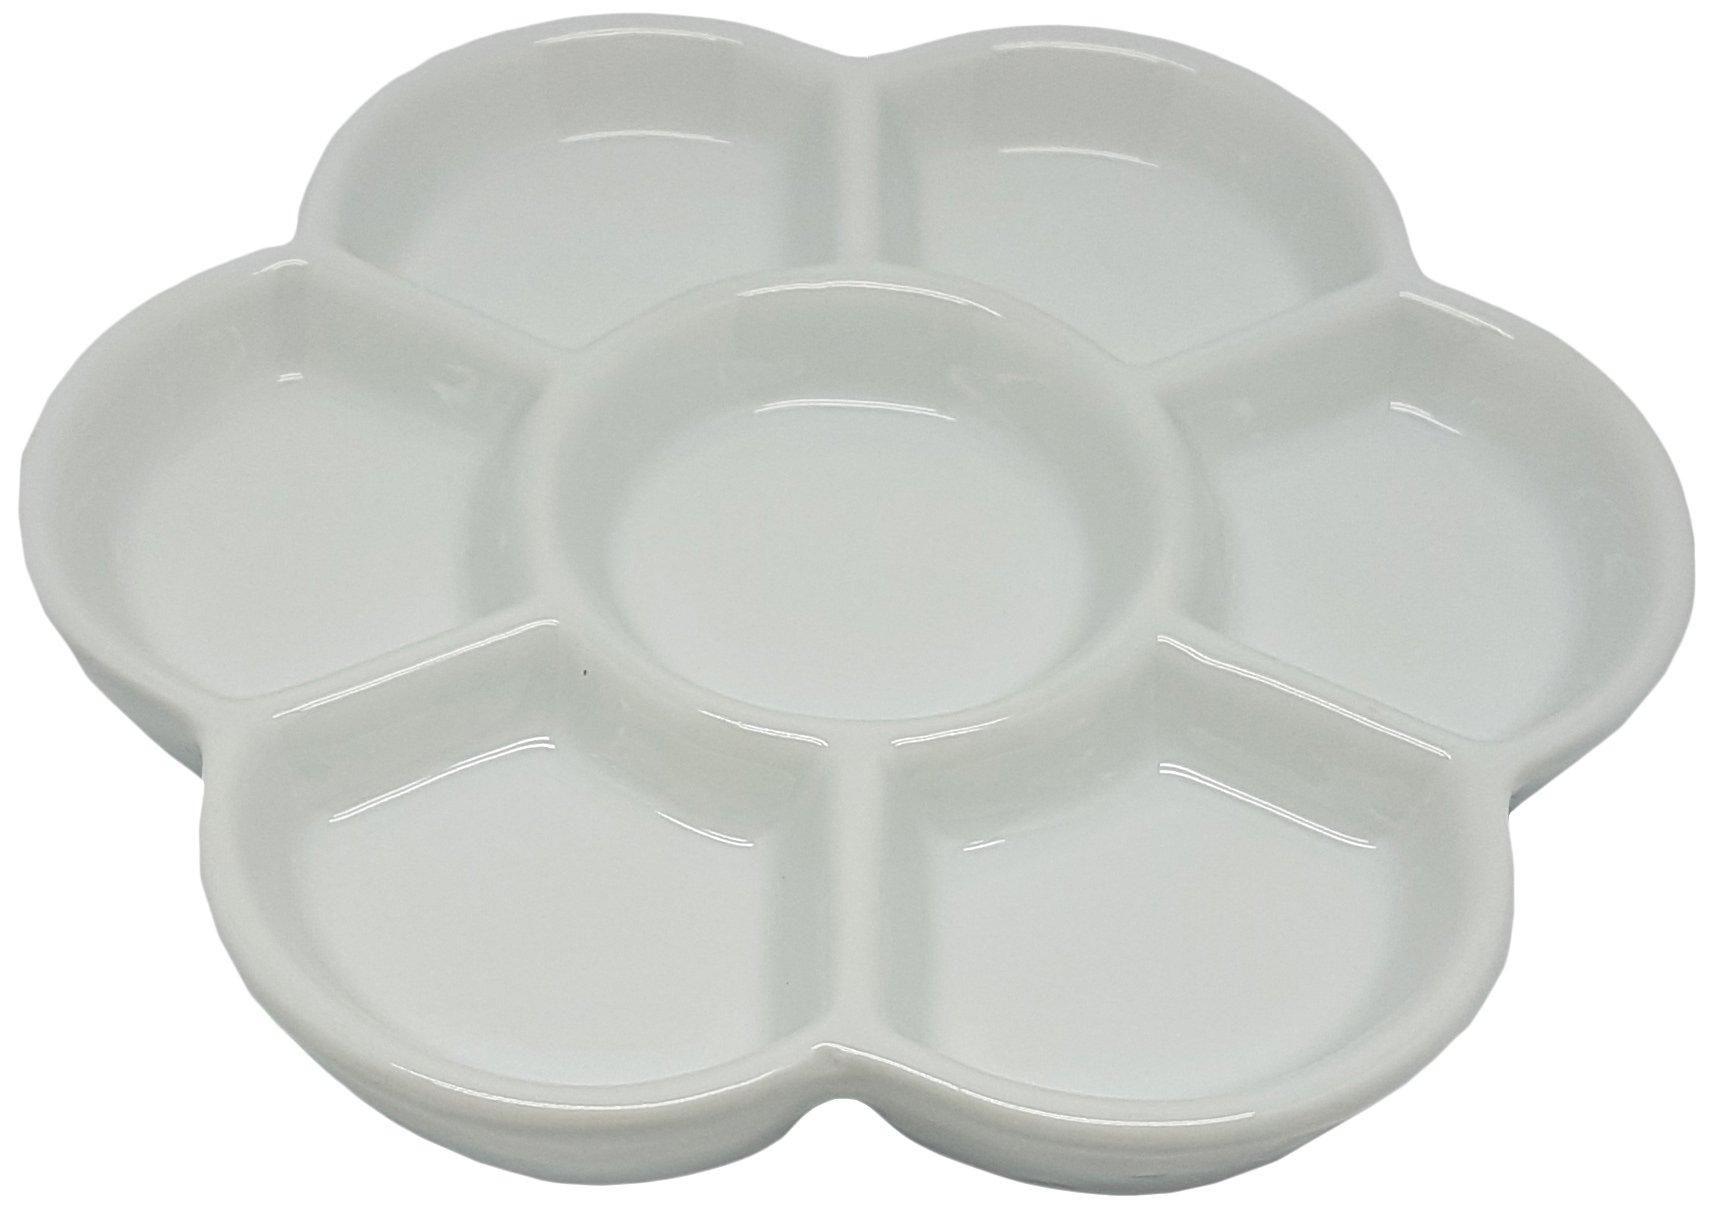 Porcelain 7 Well Daisy Mixing Tray 6''